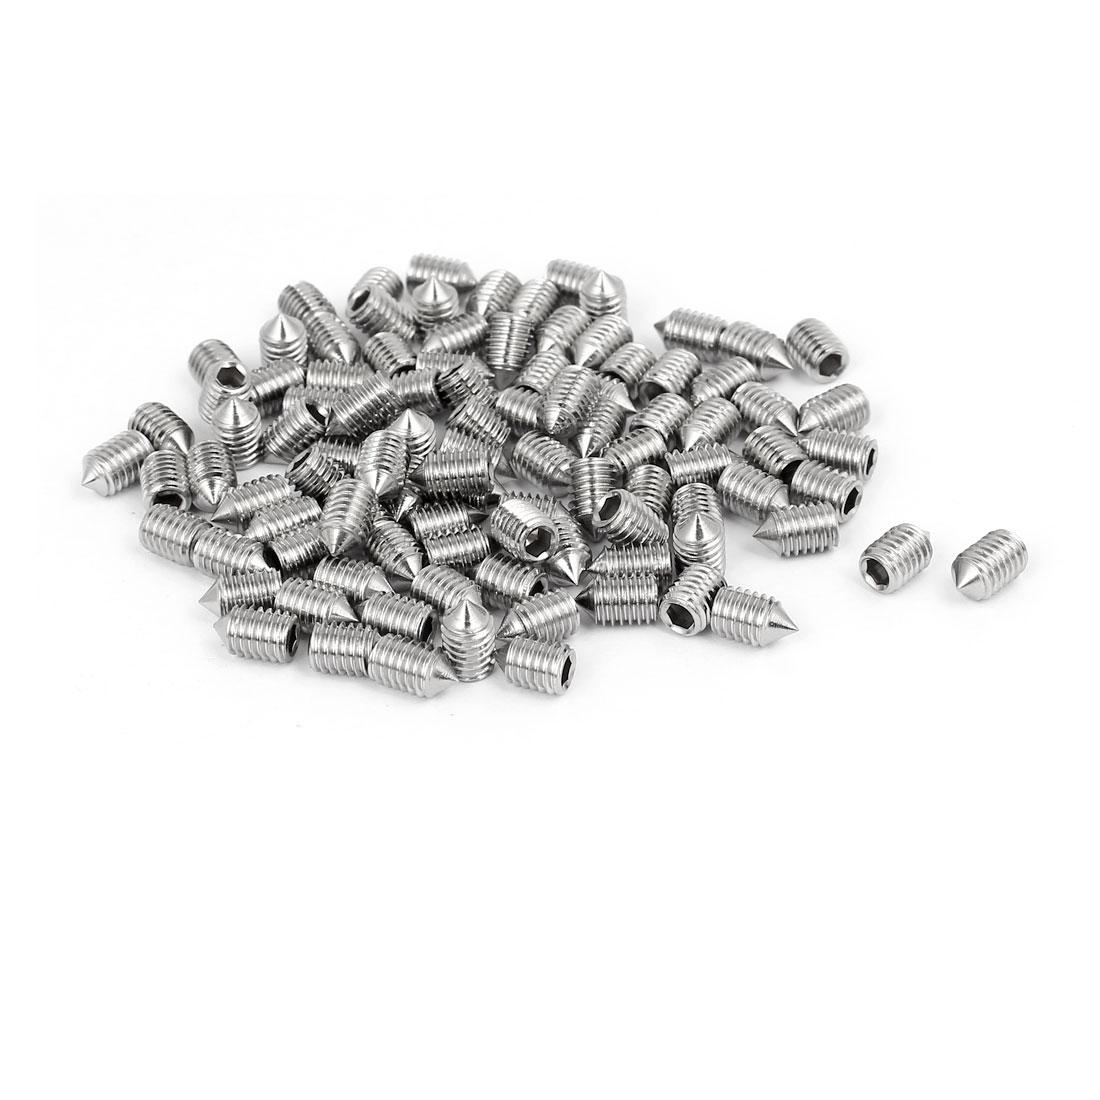 M5x8mm 304 Stainless Steel Hex Socket Cap Head Cone Point Grub Screw 100pcs